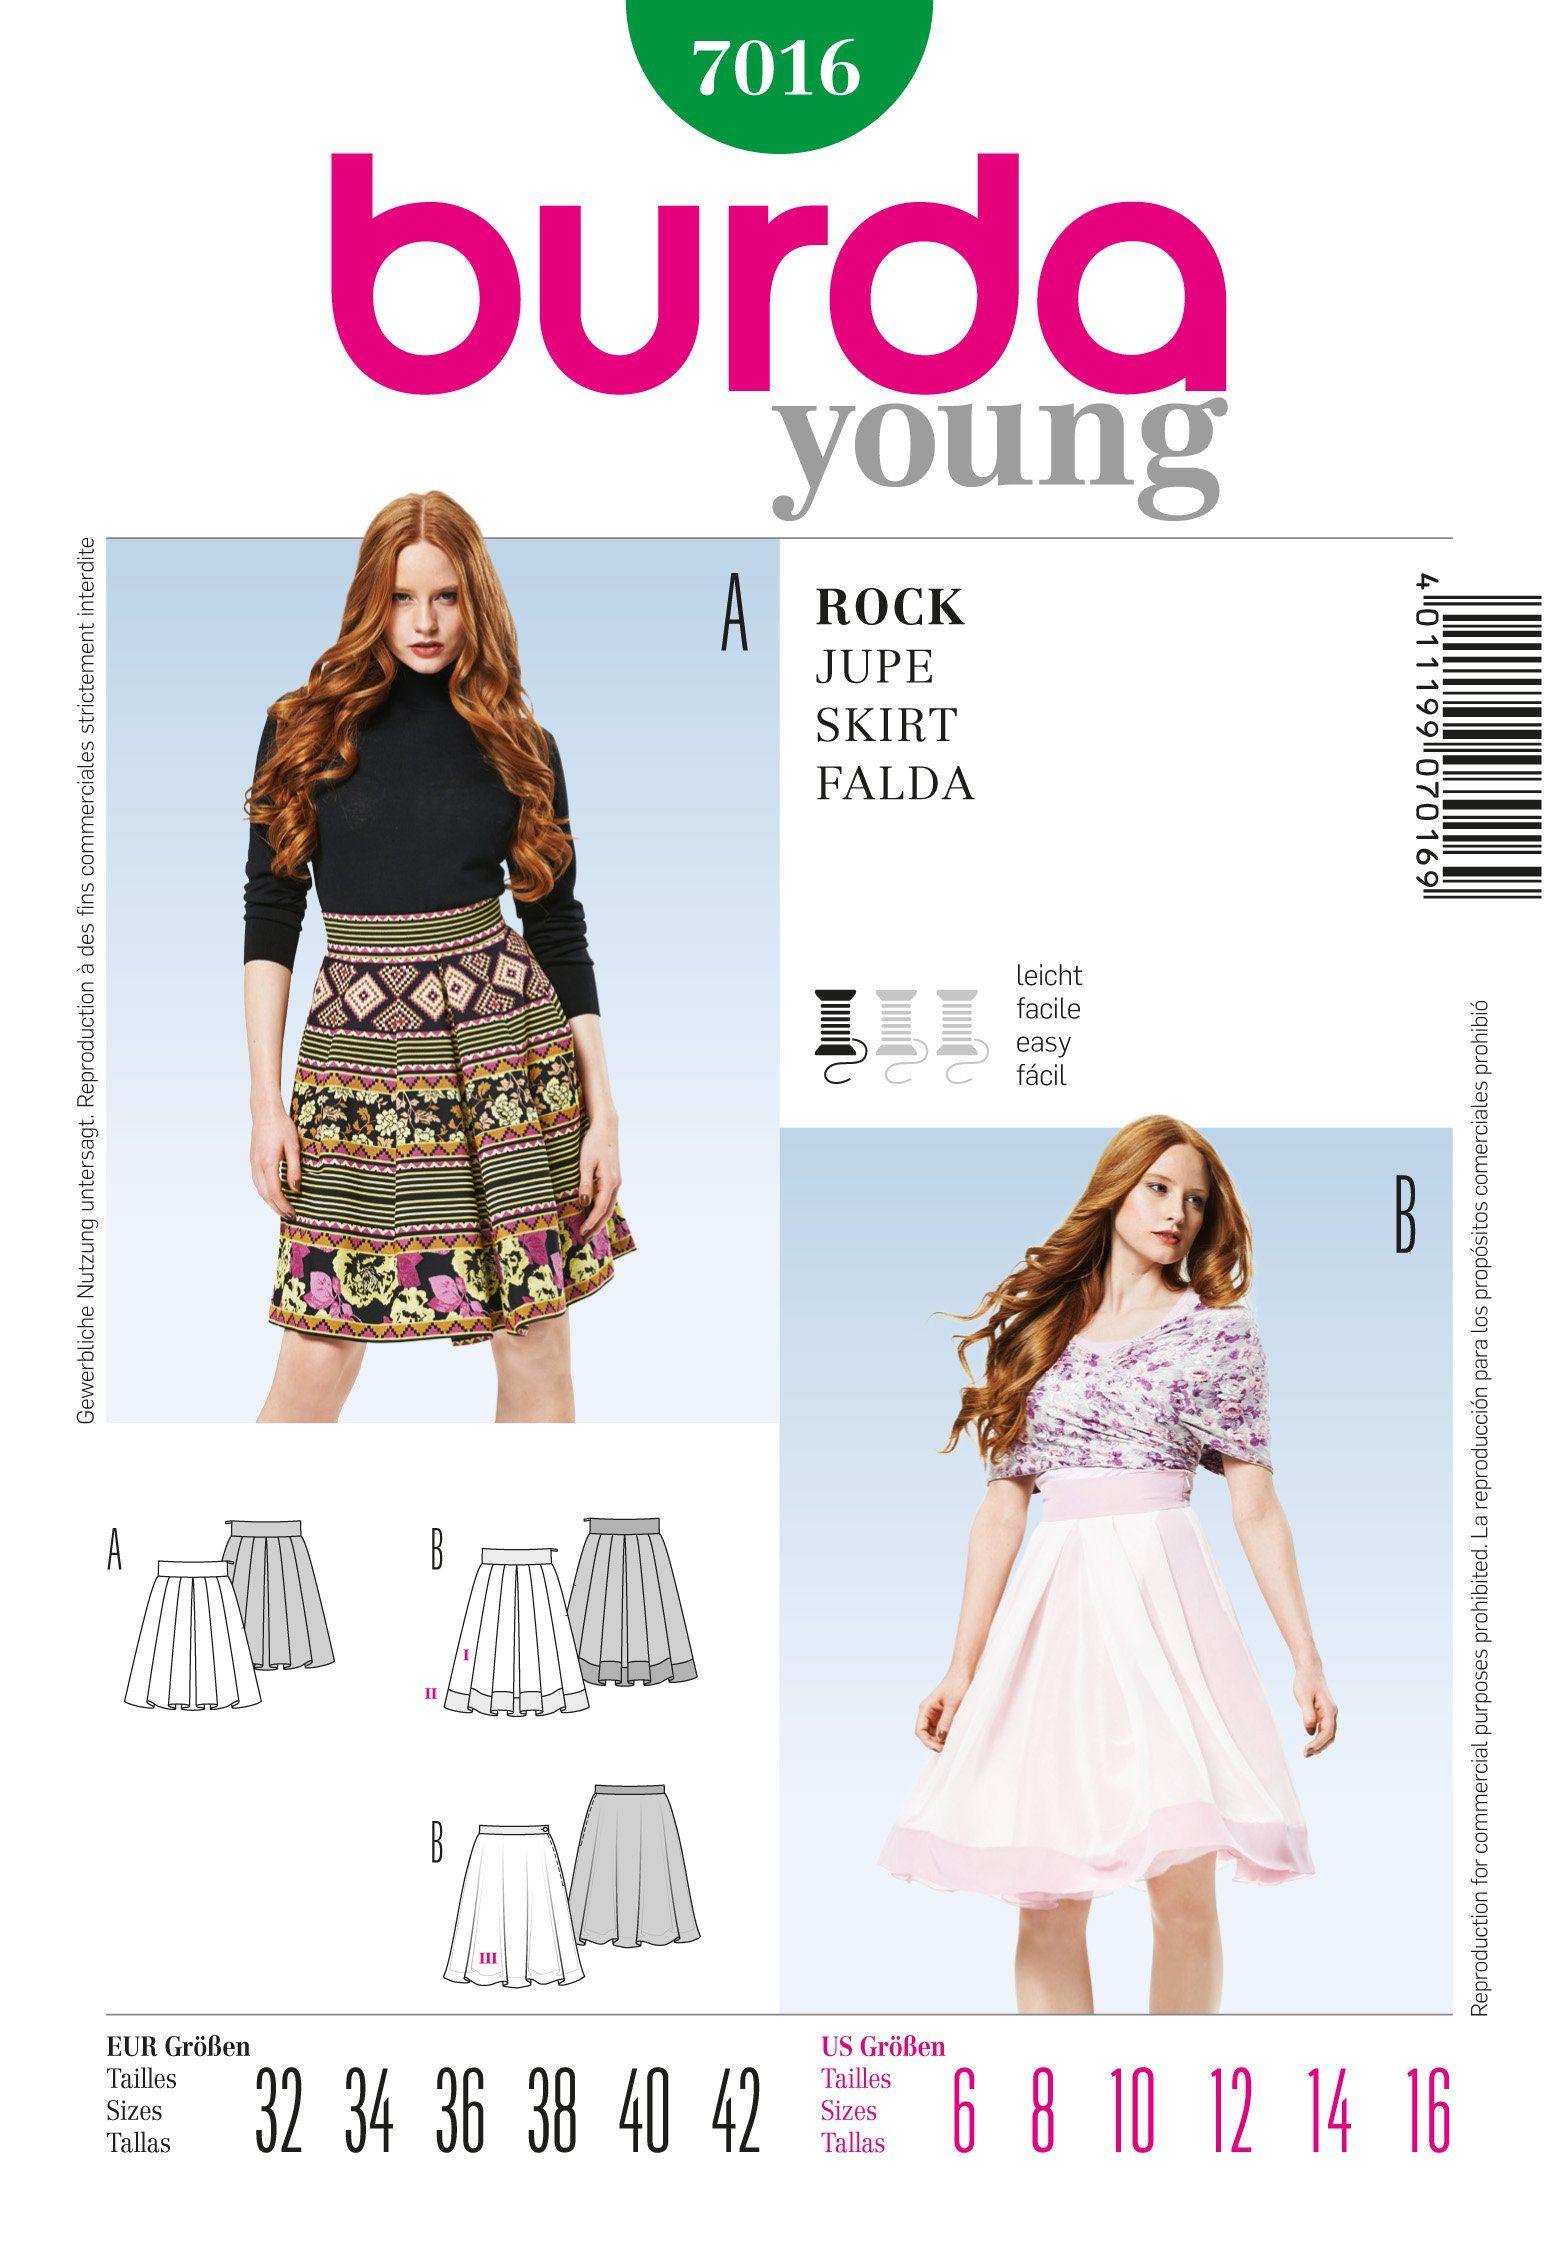 Burda Young 7016 | Patterns to make | Pinterest